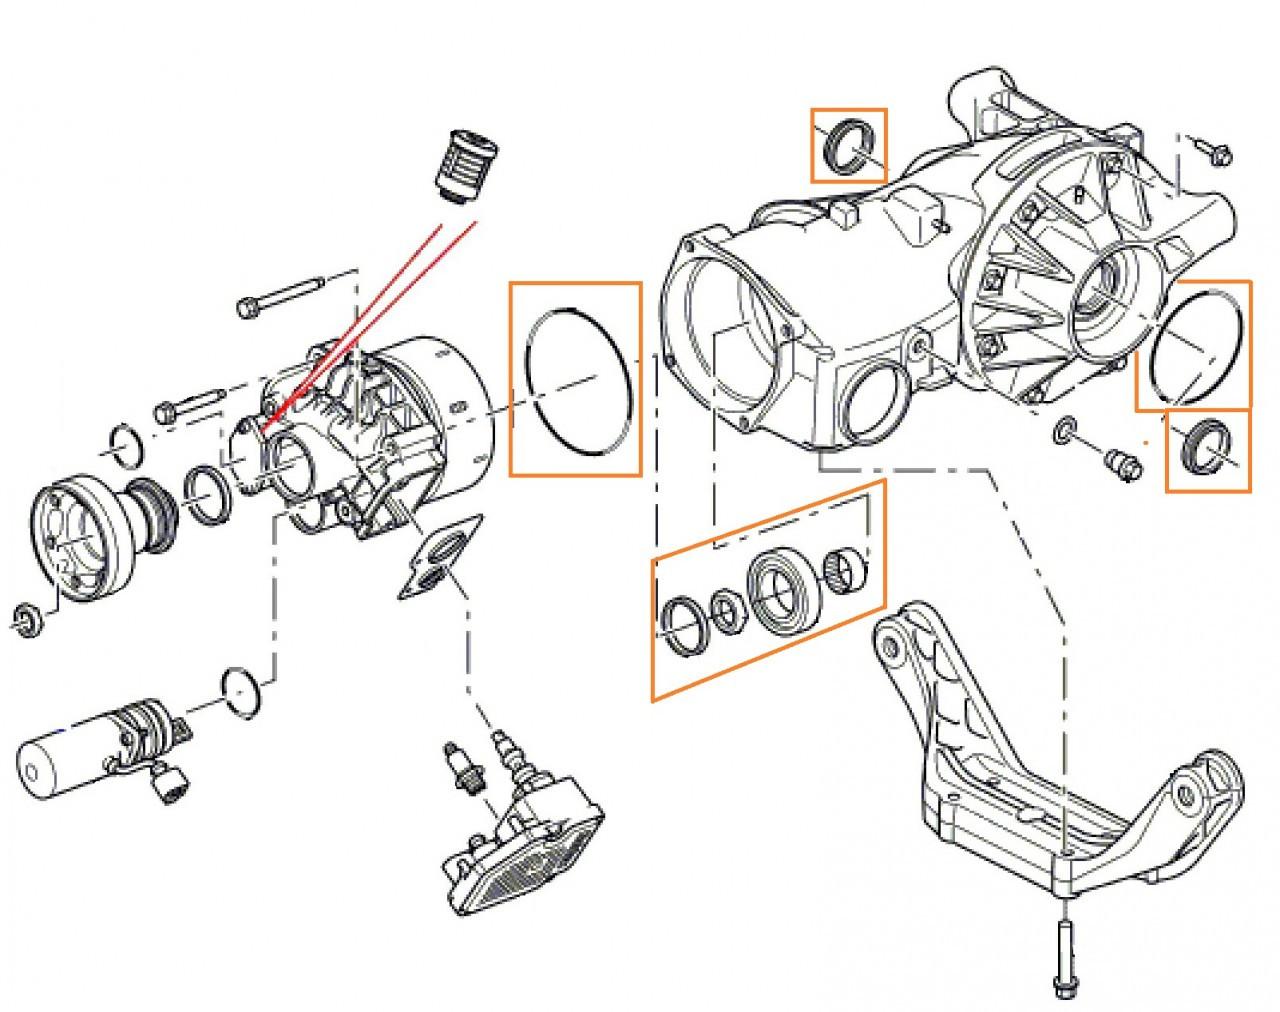 lr3 differential noise